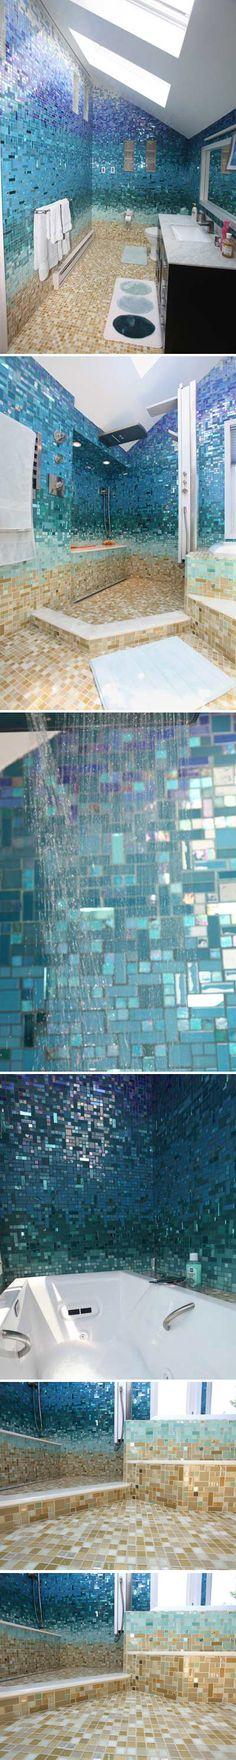 This bathroom features a custom tile design by Emily Jablon,  using different sized mosaic tiles & blending them in a seamless gradient. From Mother & Daughter Team, Susan & Emily Jablon :: http://www.susanjablon.com/bath/photos/glass-tile-bathroom-photos.html